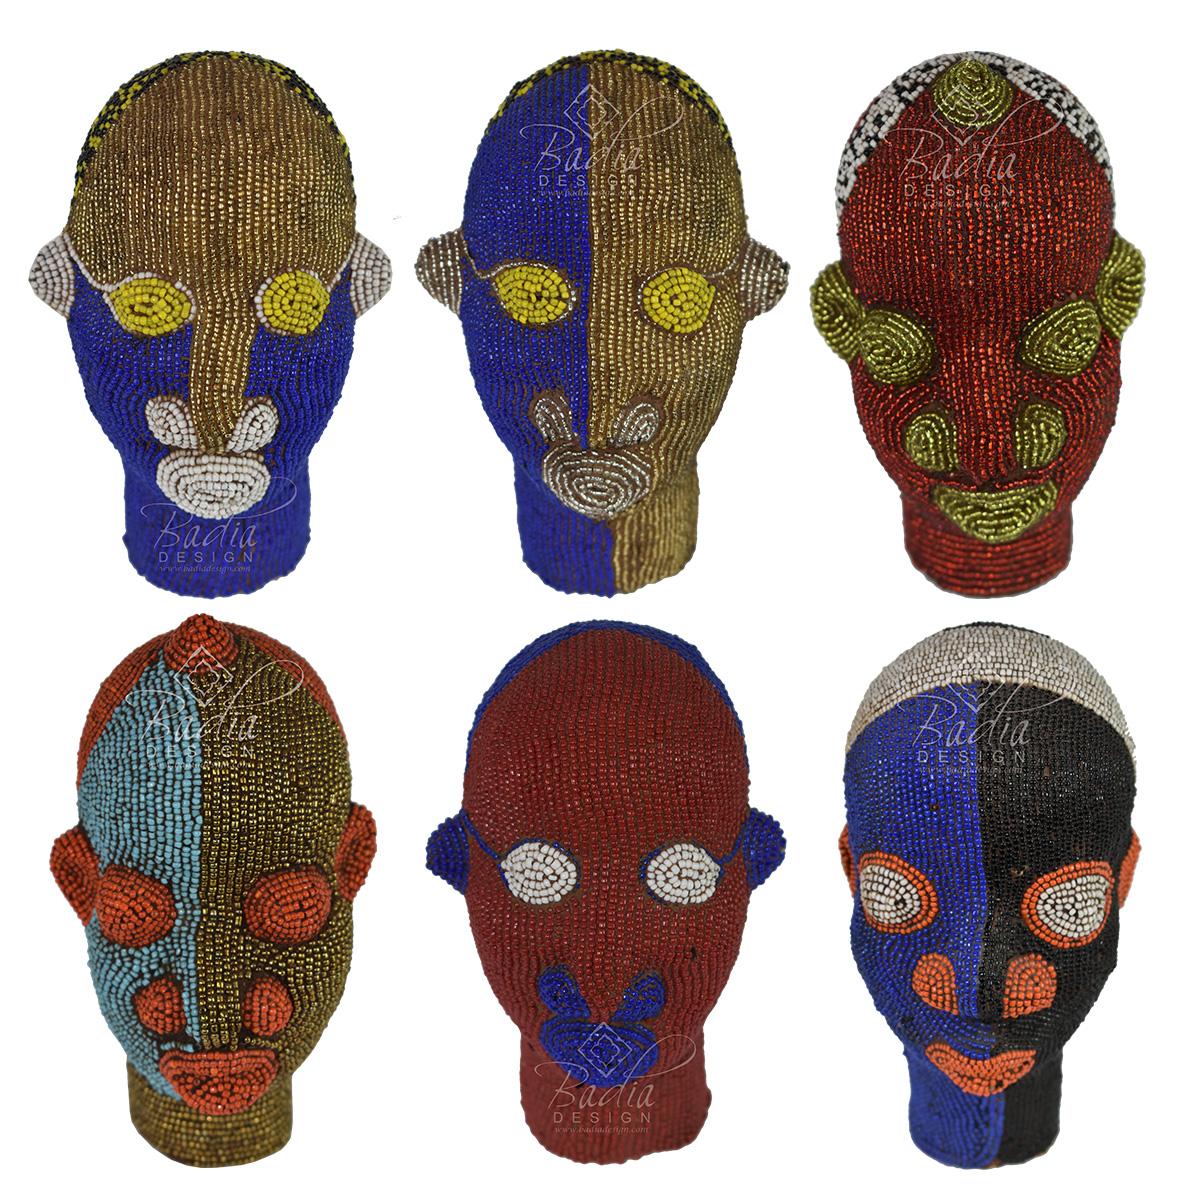 african-beaded-head-badia-design-hd245.jpg